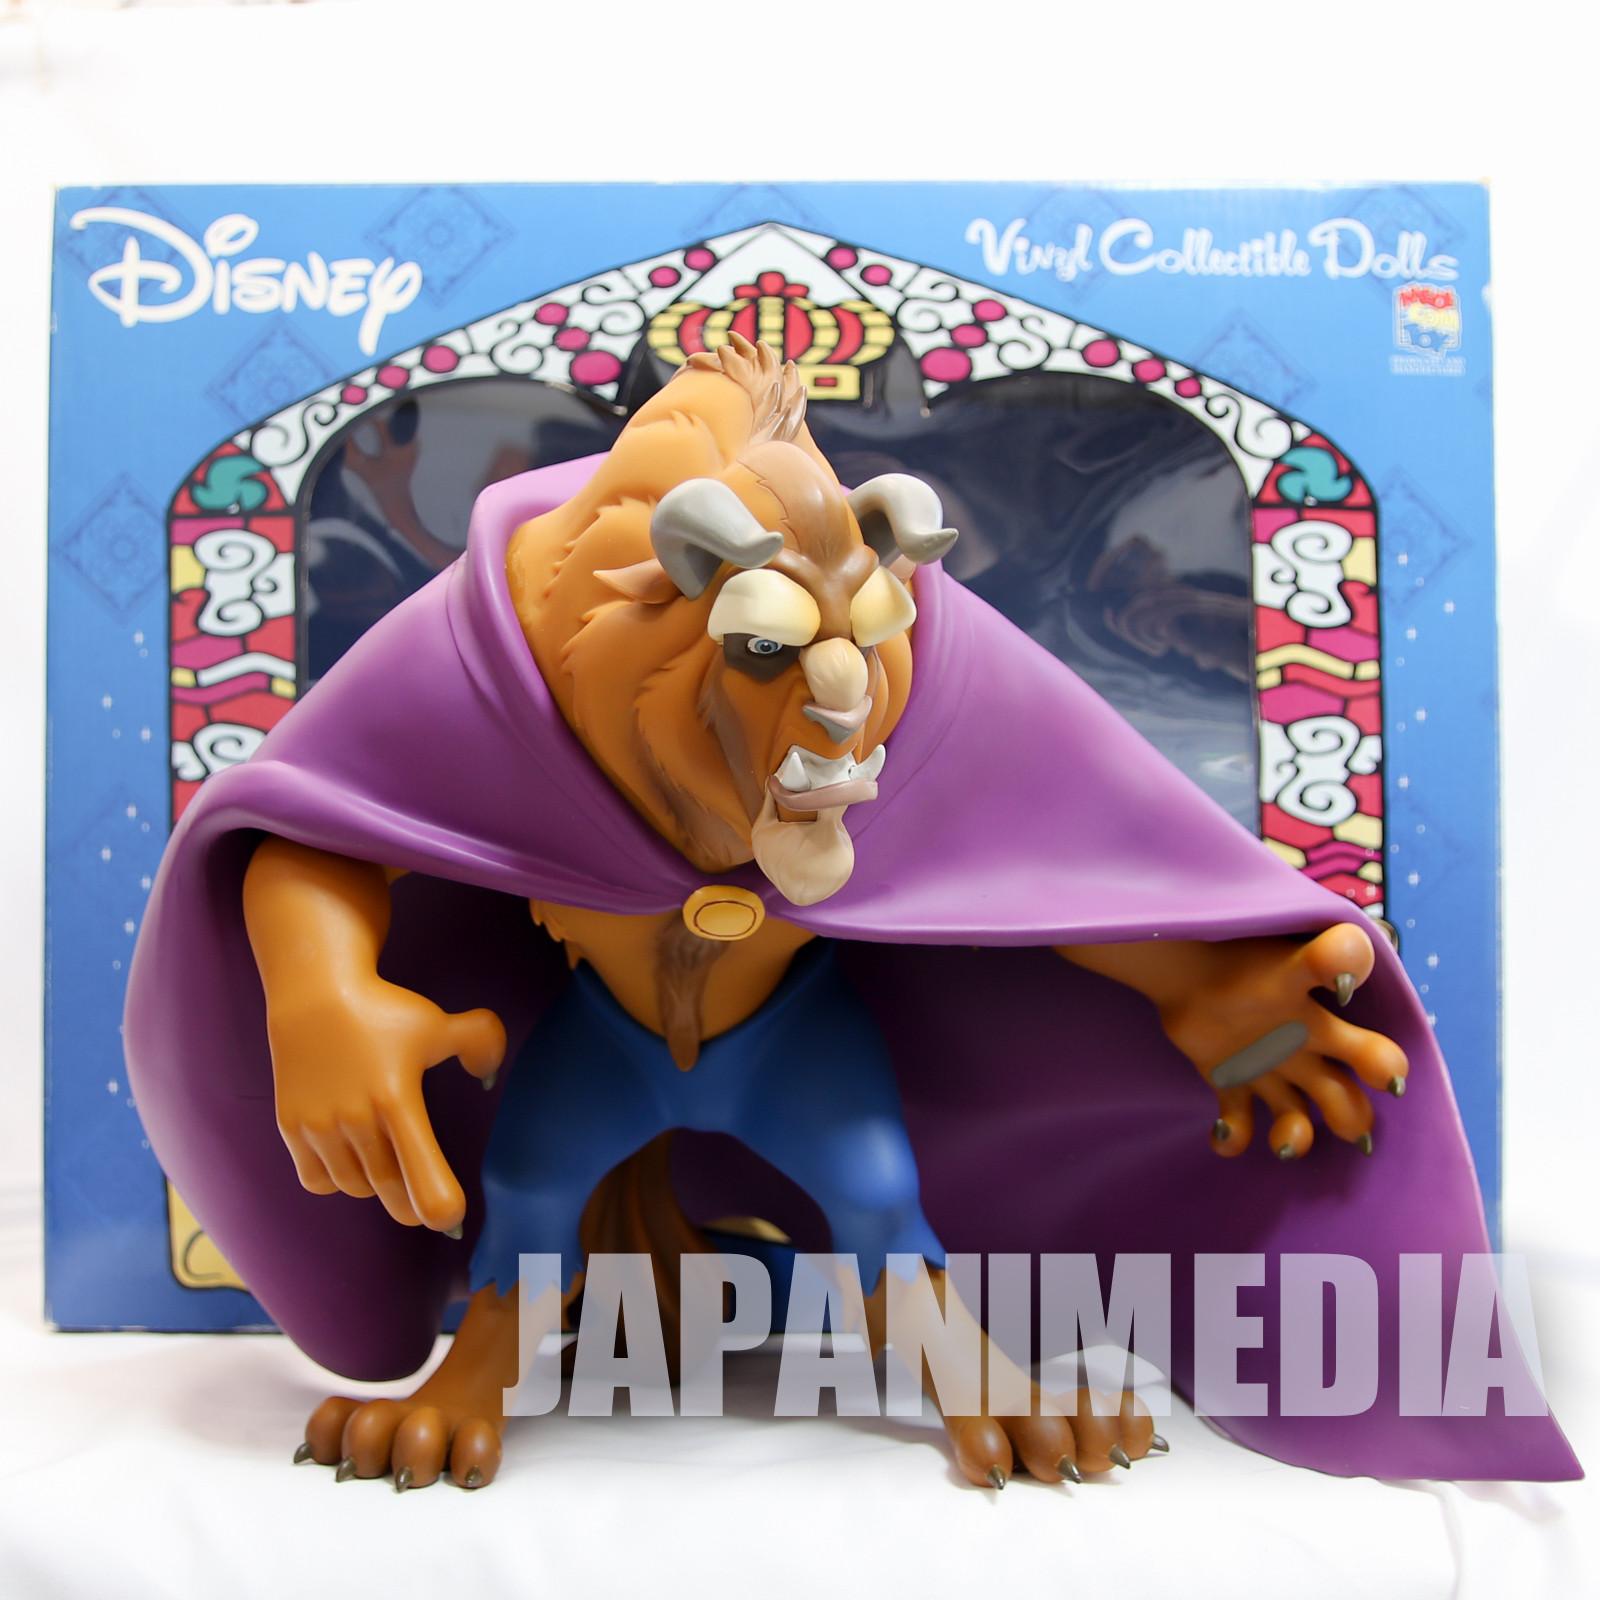 Disney Beauty and the Beast Figure VCD Medicom Toy JAPAN ANIME